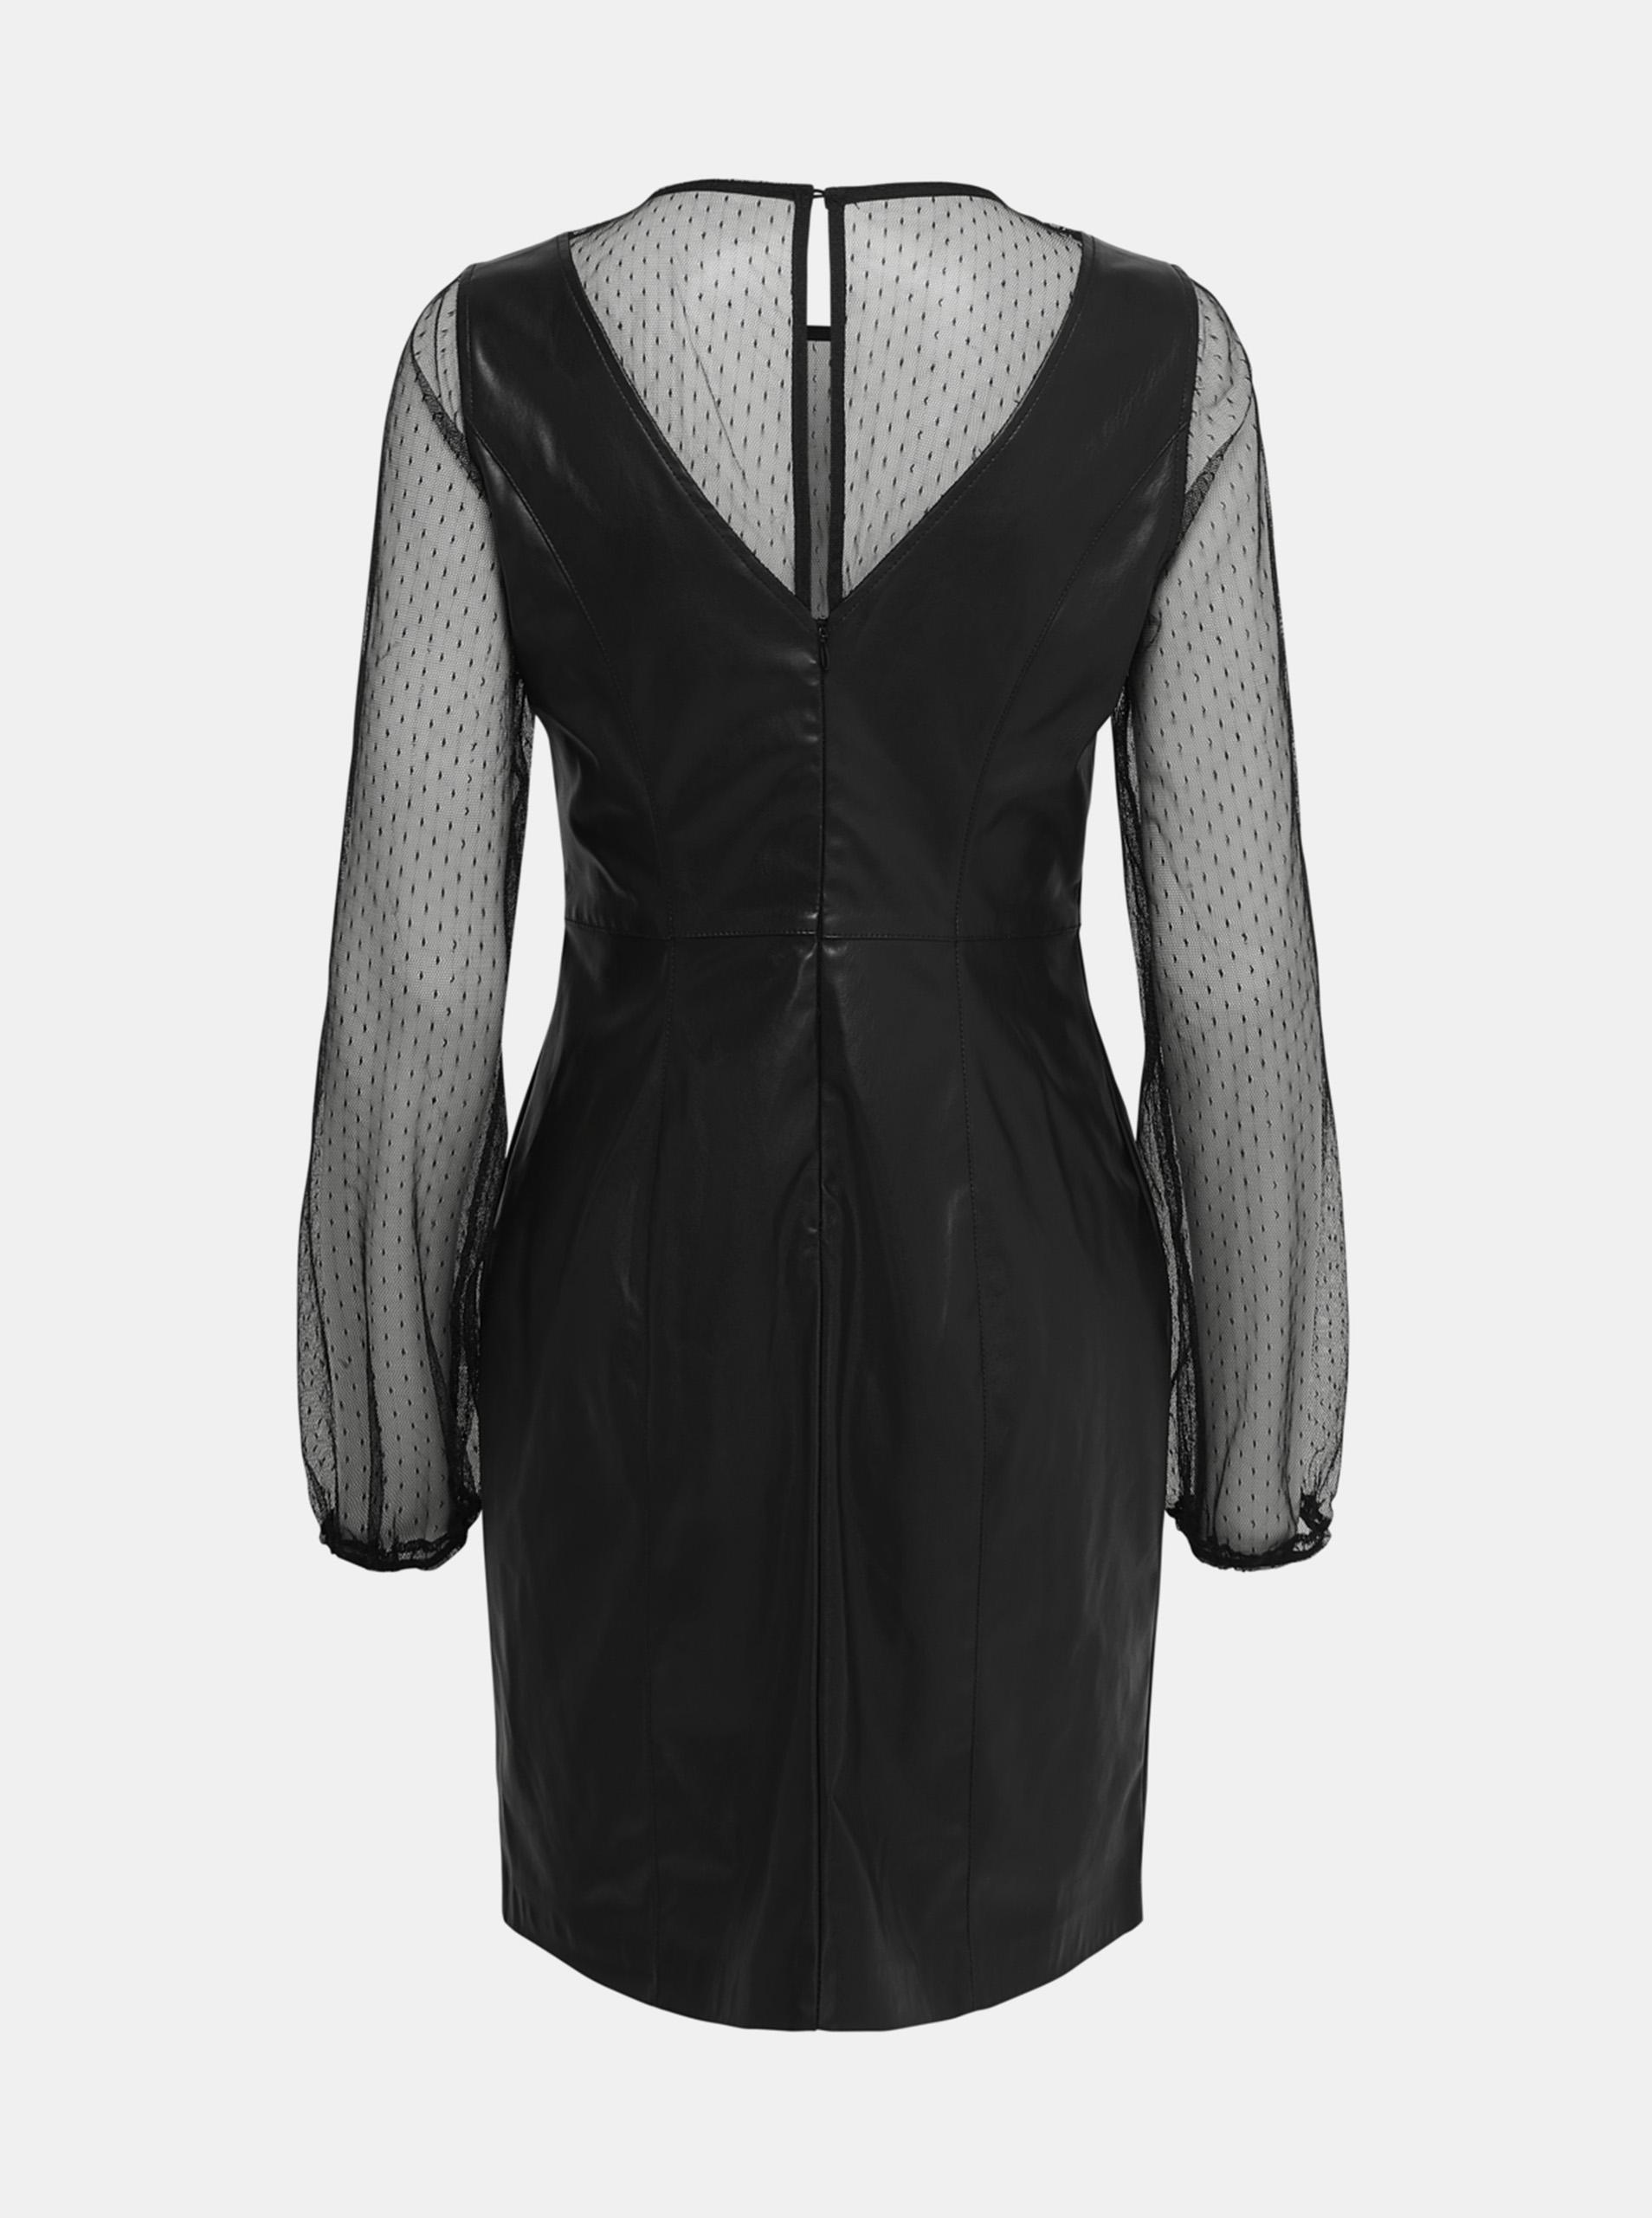 Črna obleka s SAMO britt zaključkom